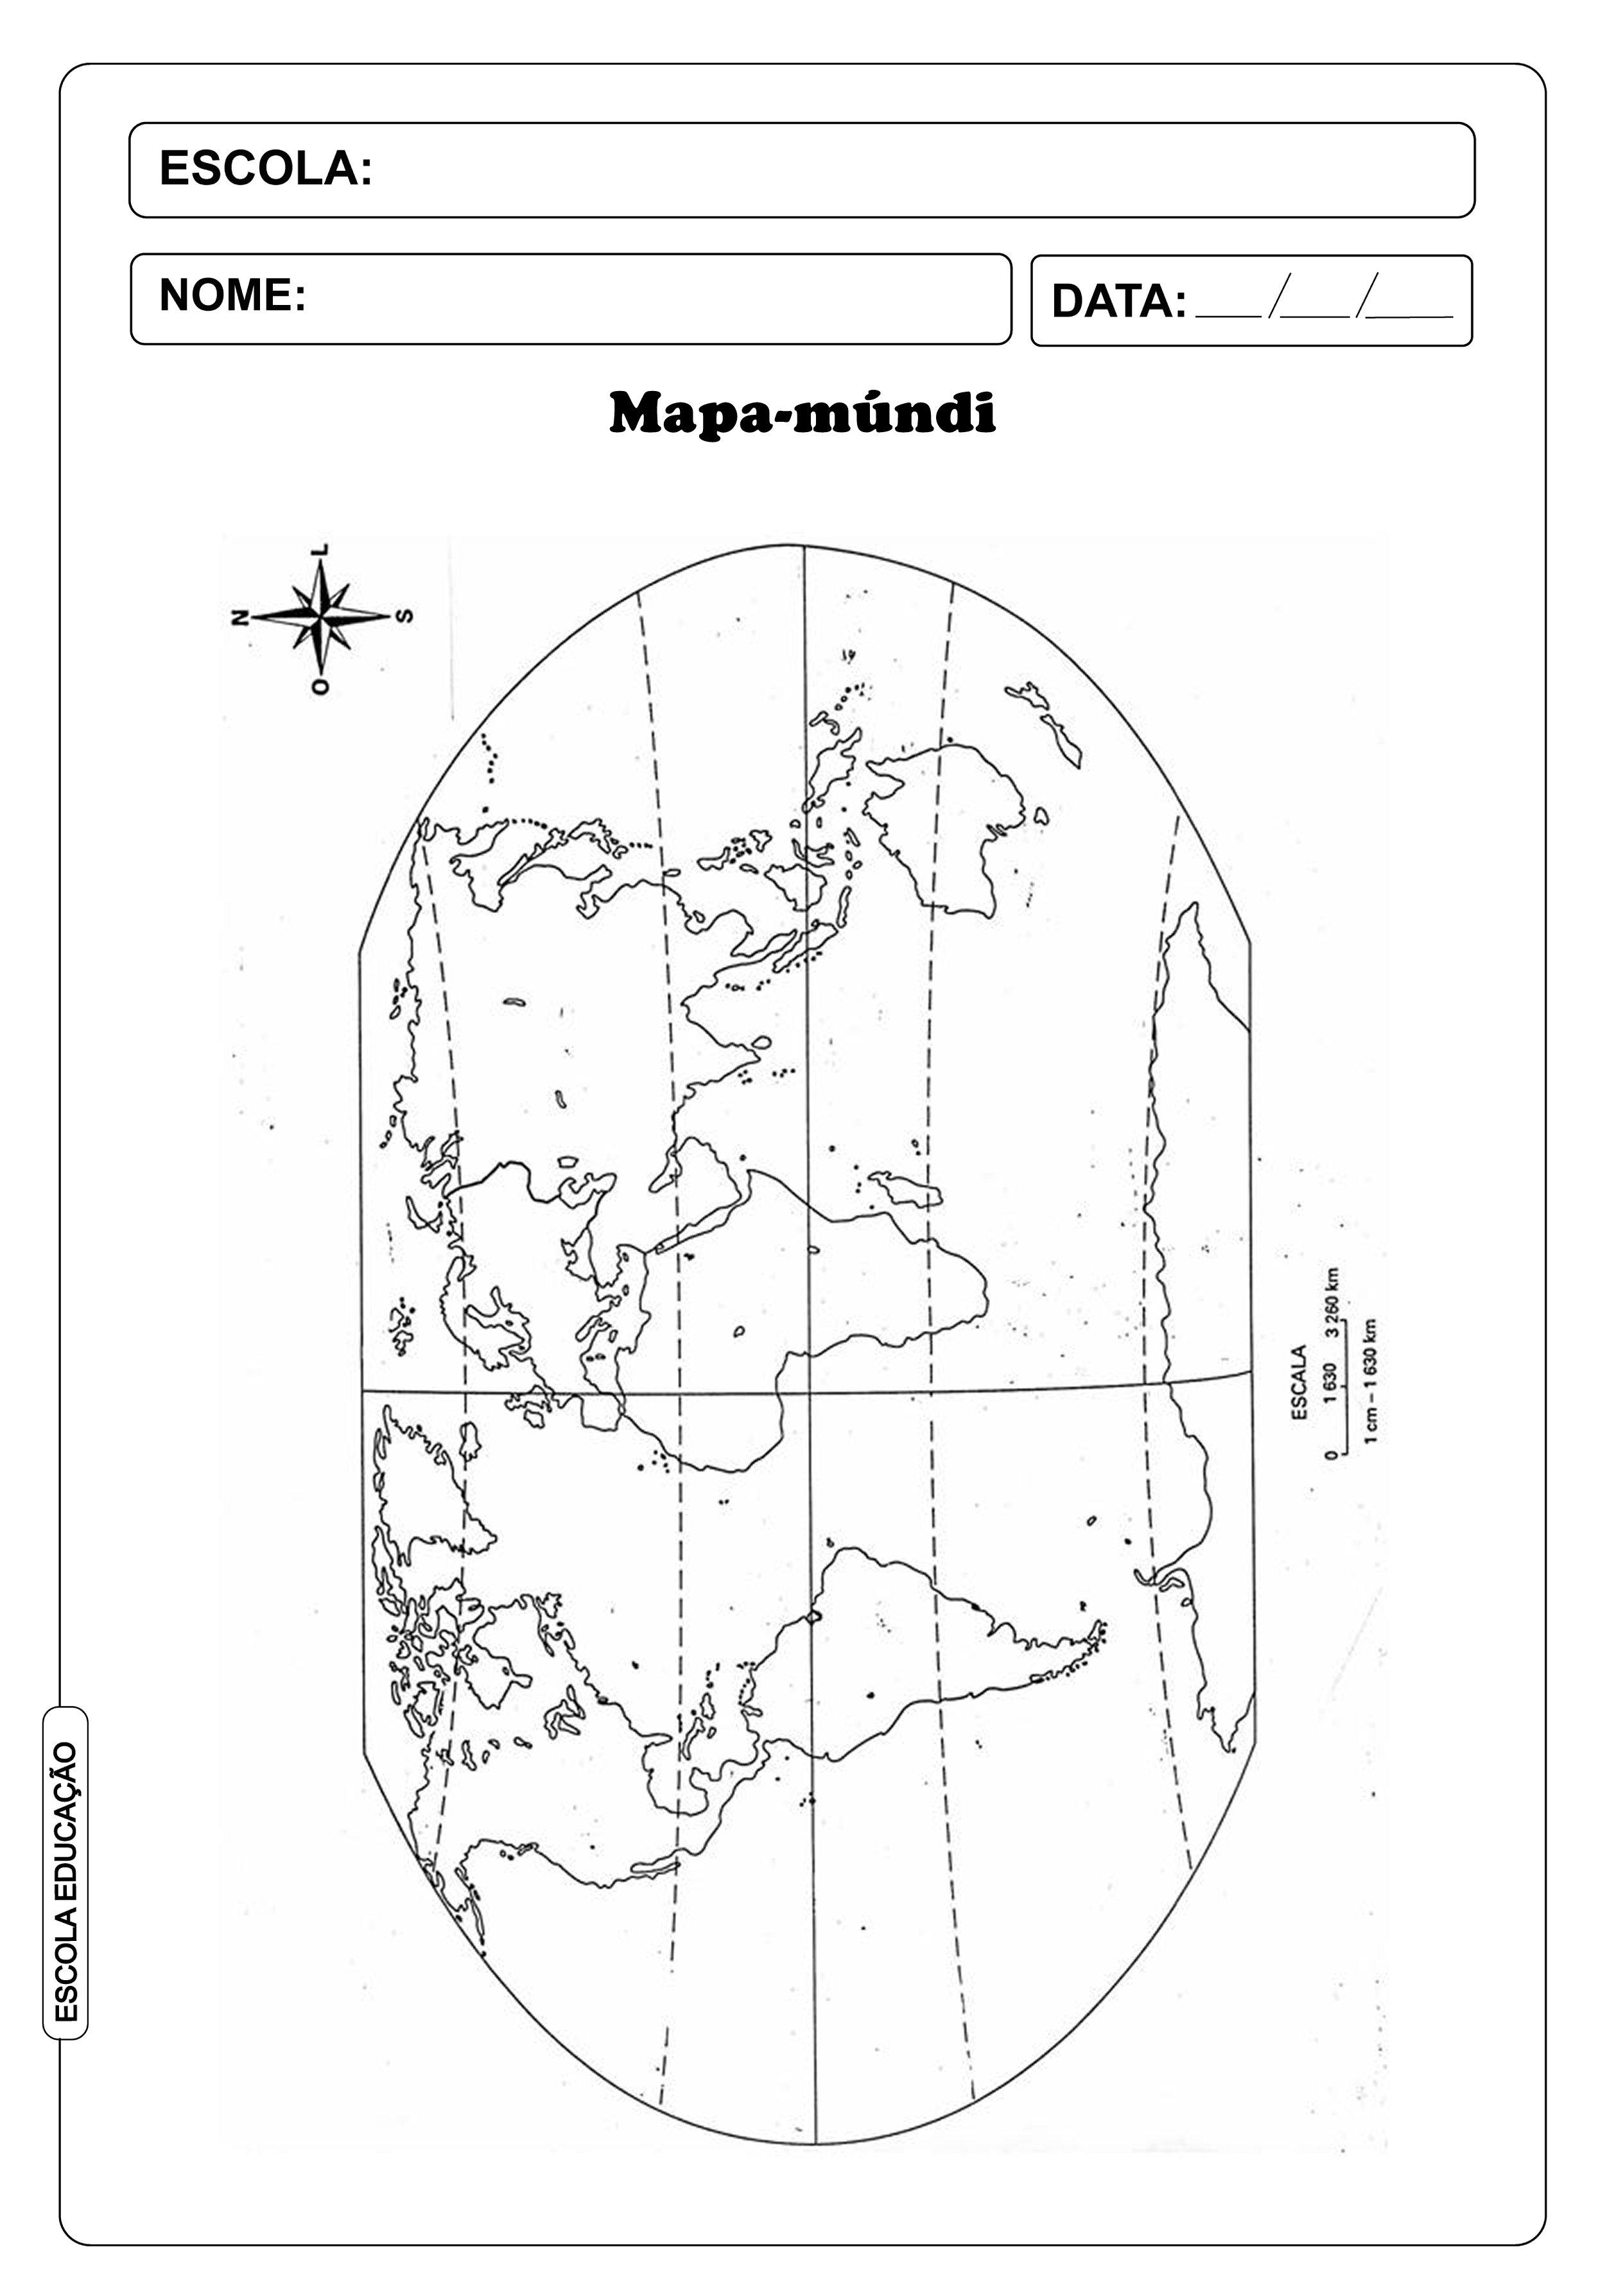 Mapa Mundi Para Imprimir E Colorir Escola Educacao